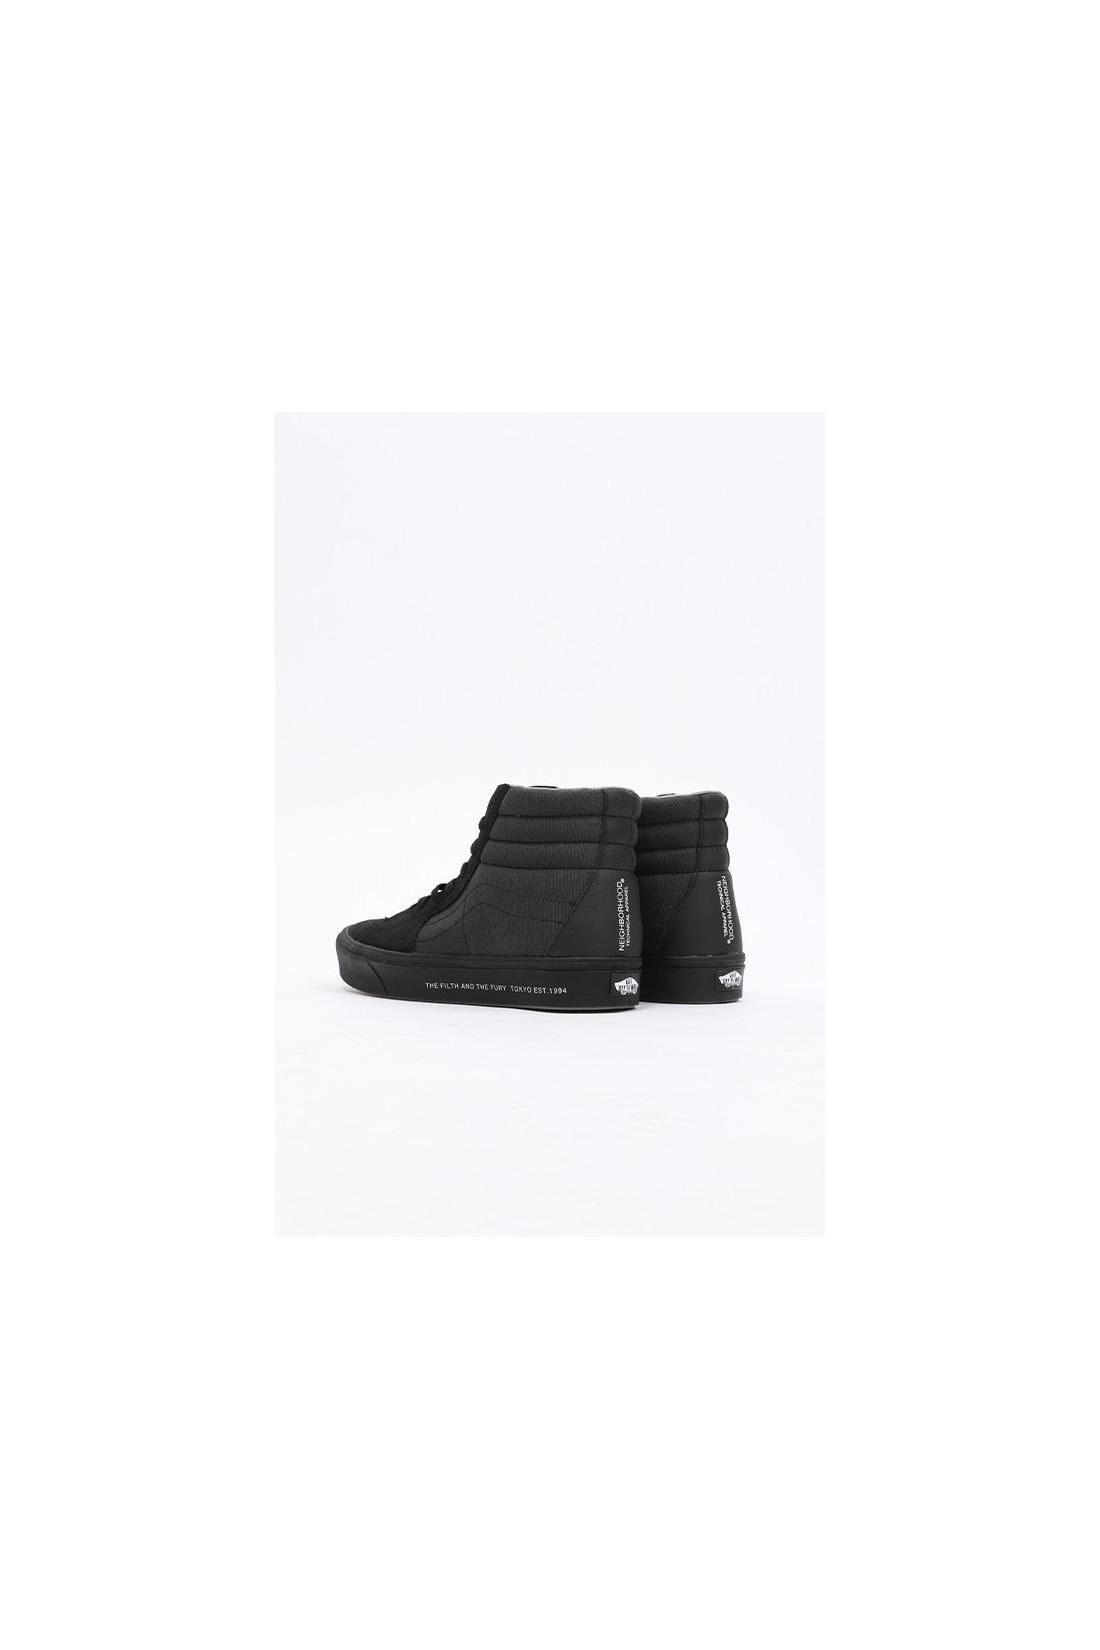 NEIGHBORHOOD / Vans x neighborhood sk8-hi Black